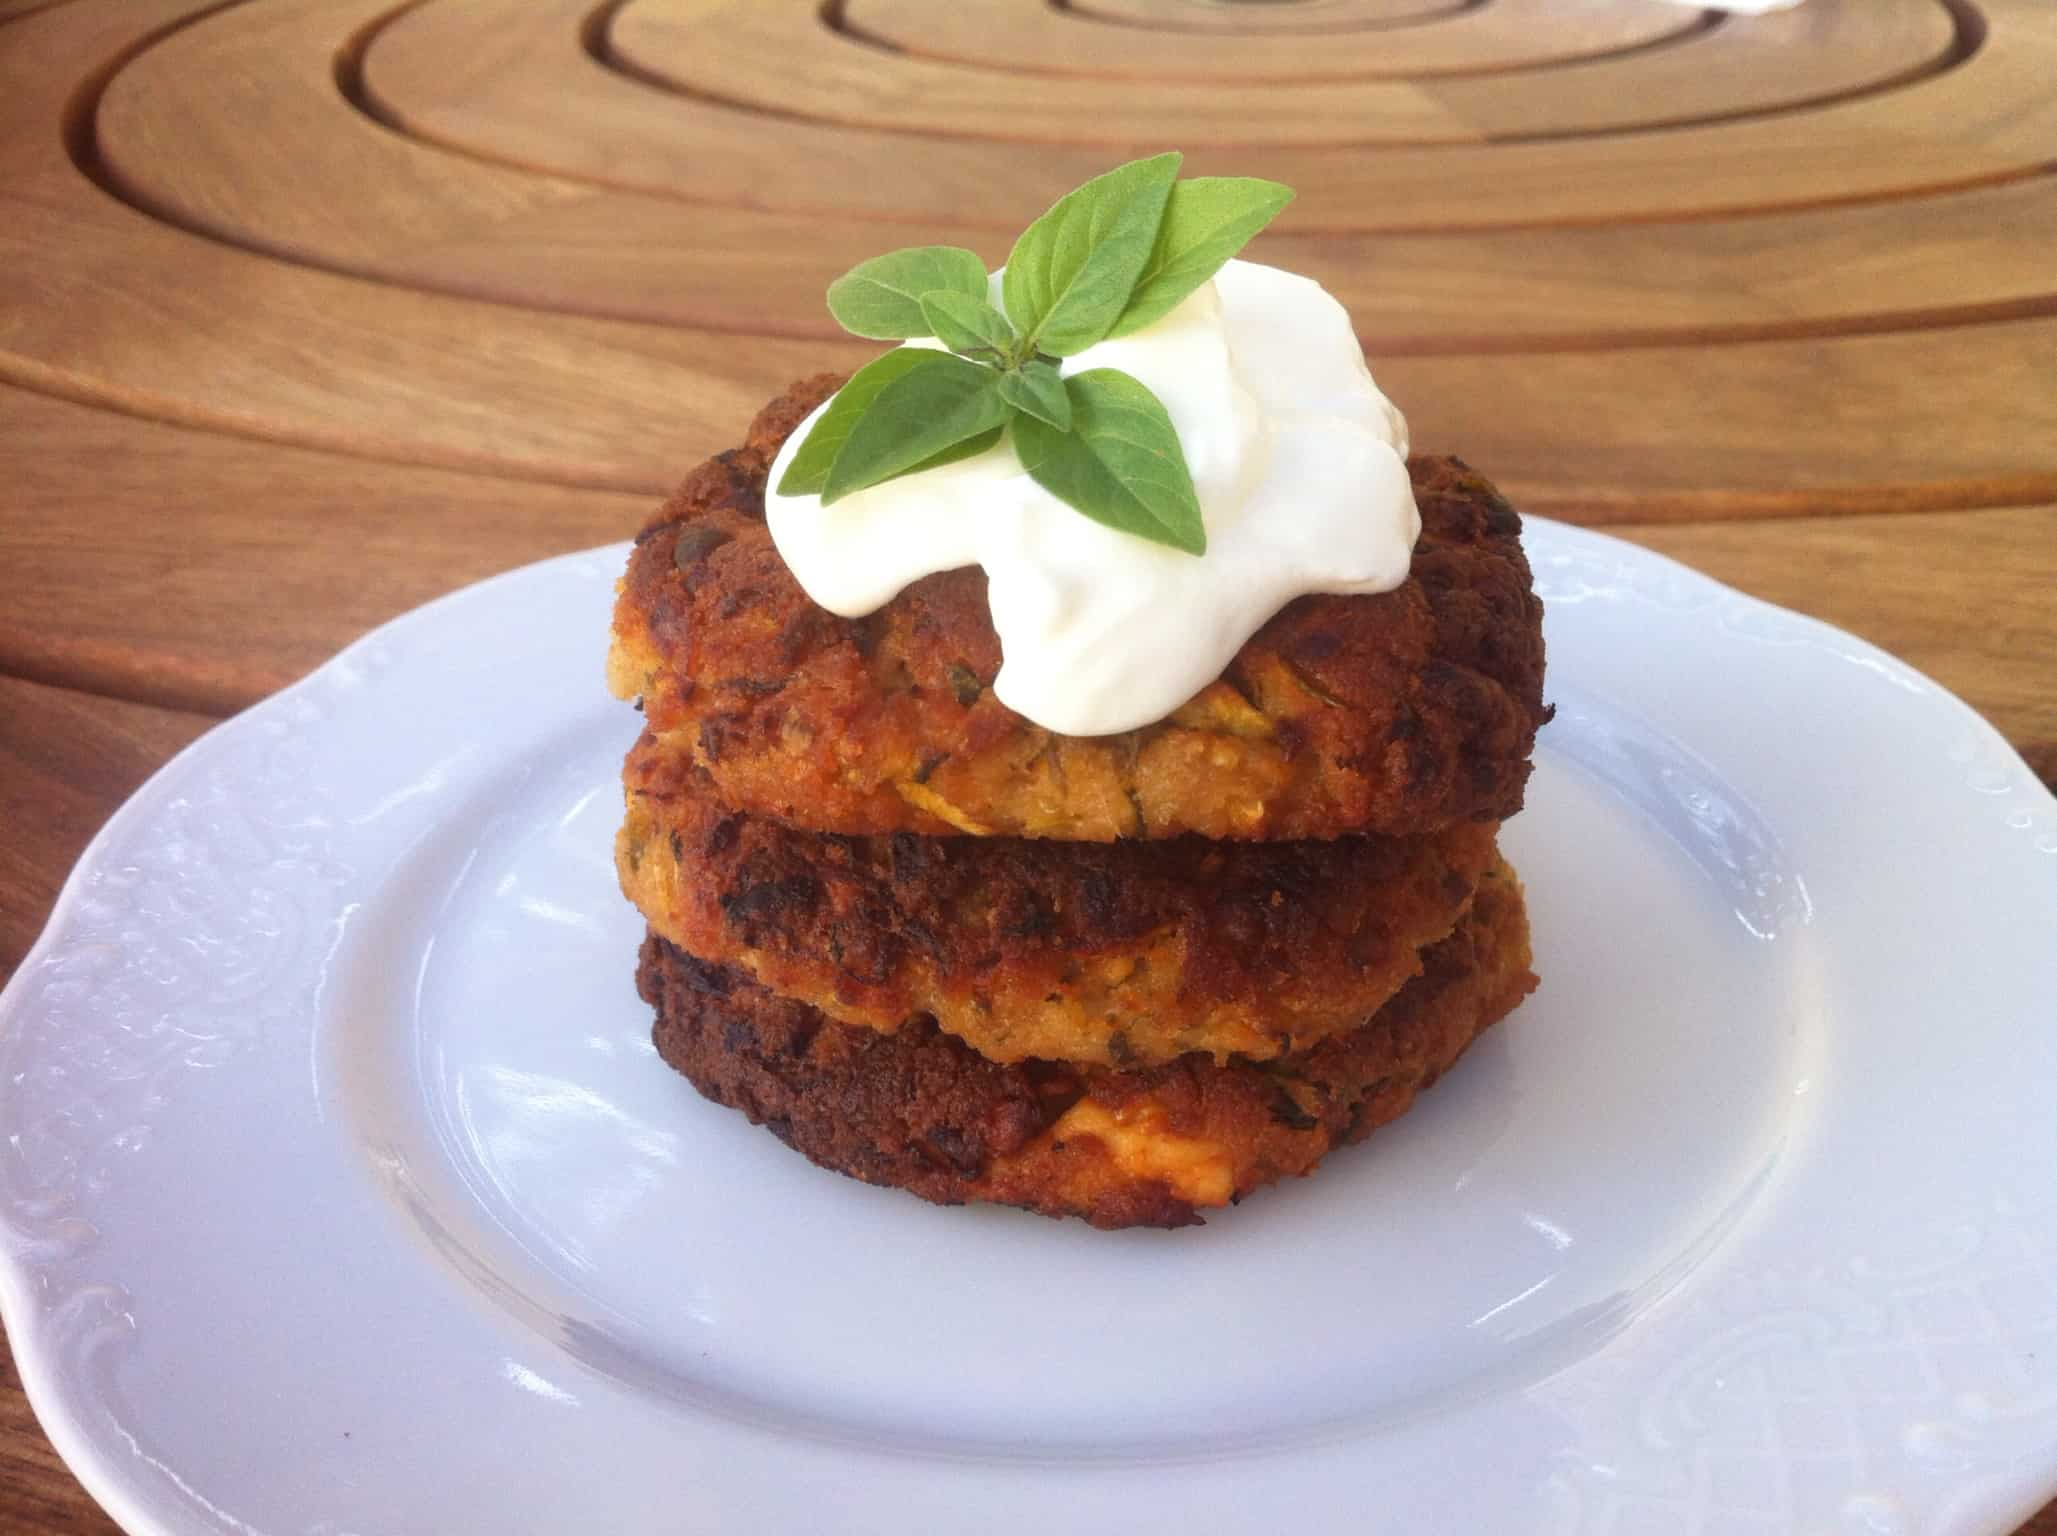 Kolokithokeftedes (Fried Zucchini Balls or Courgette)